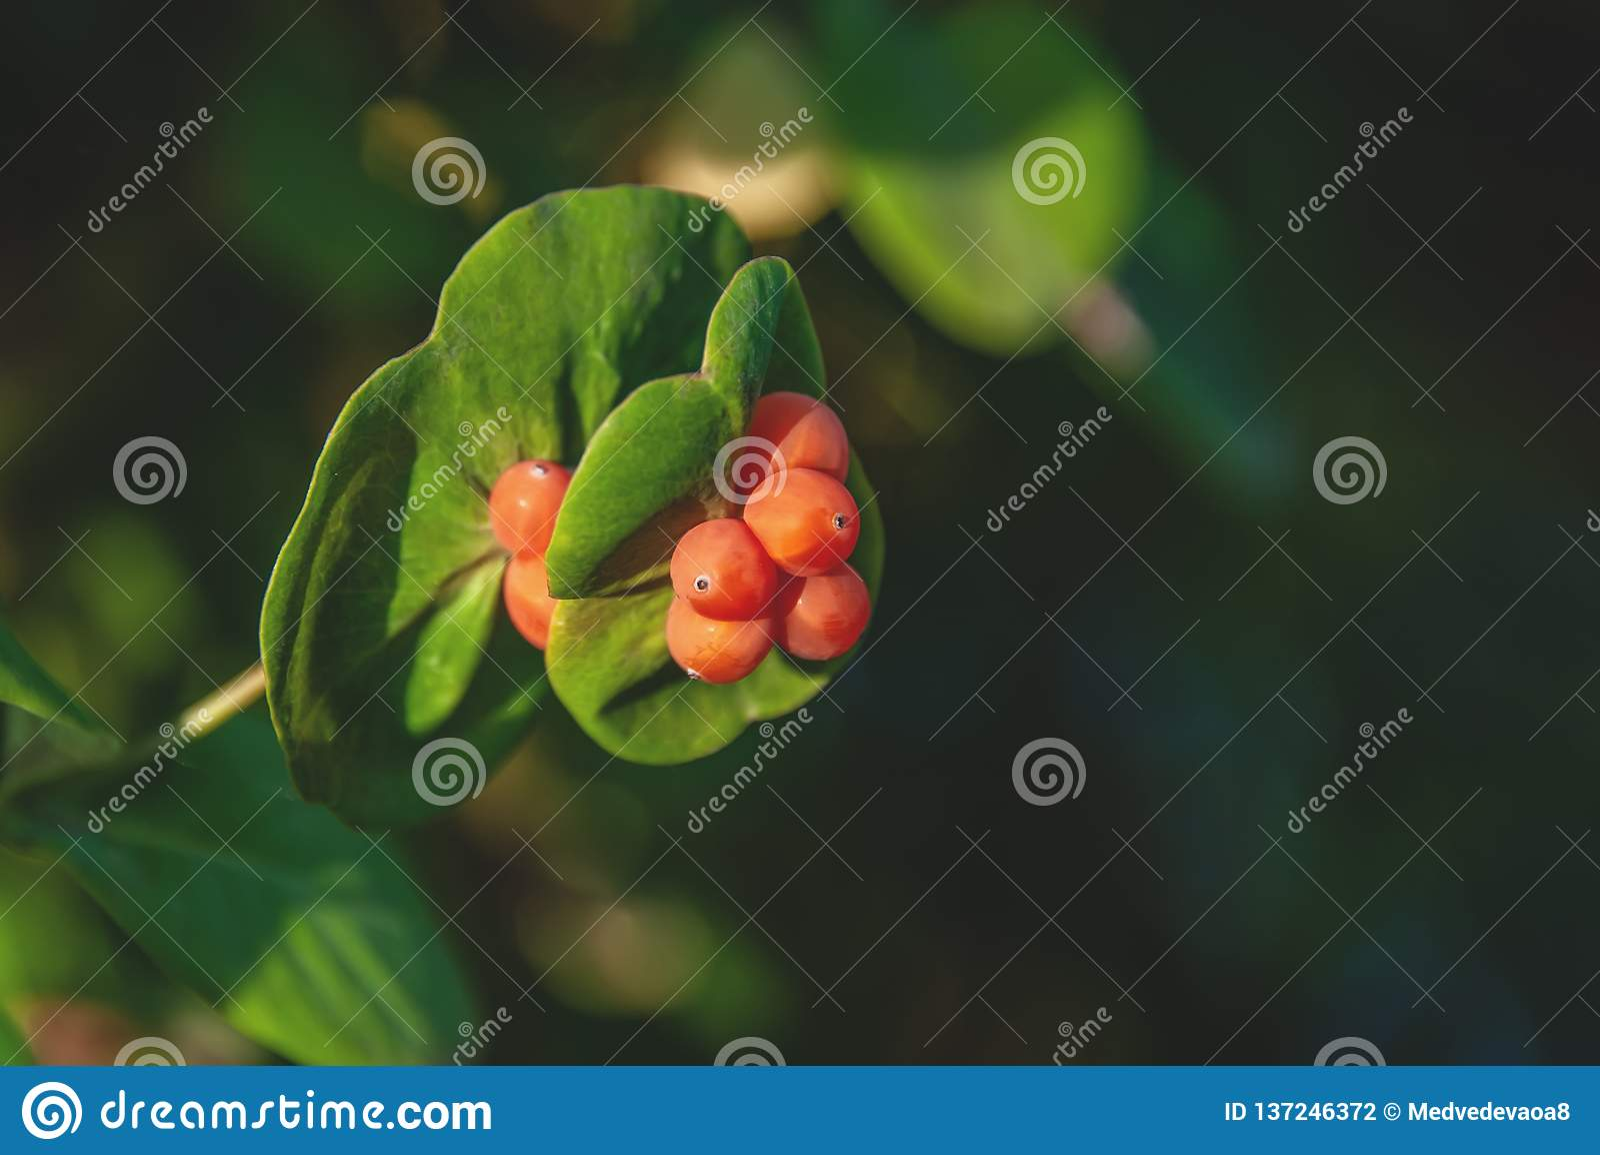 Lonicera Caprifolium, The Italian Woodbine, Perfoliate Honeysuckle